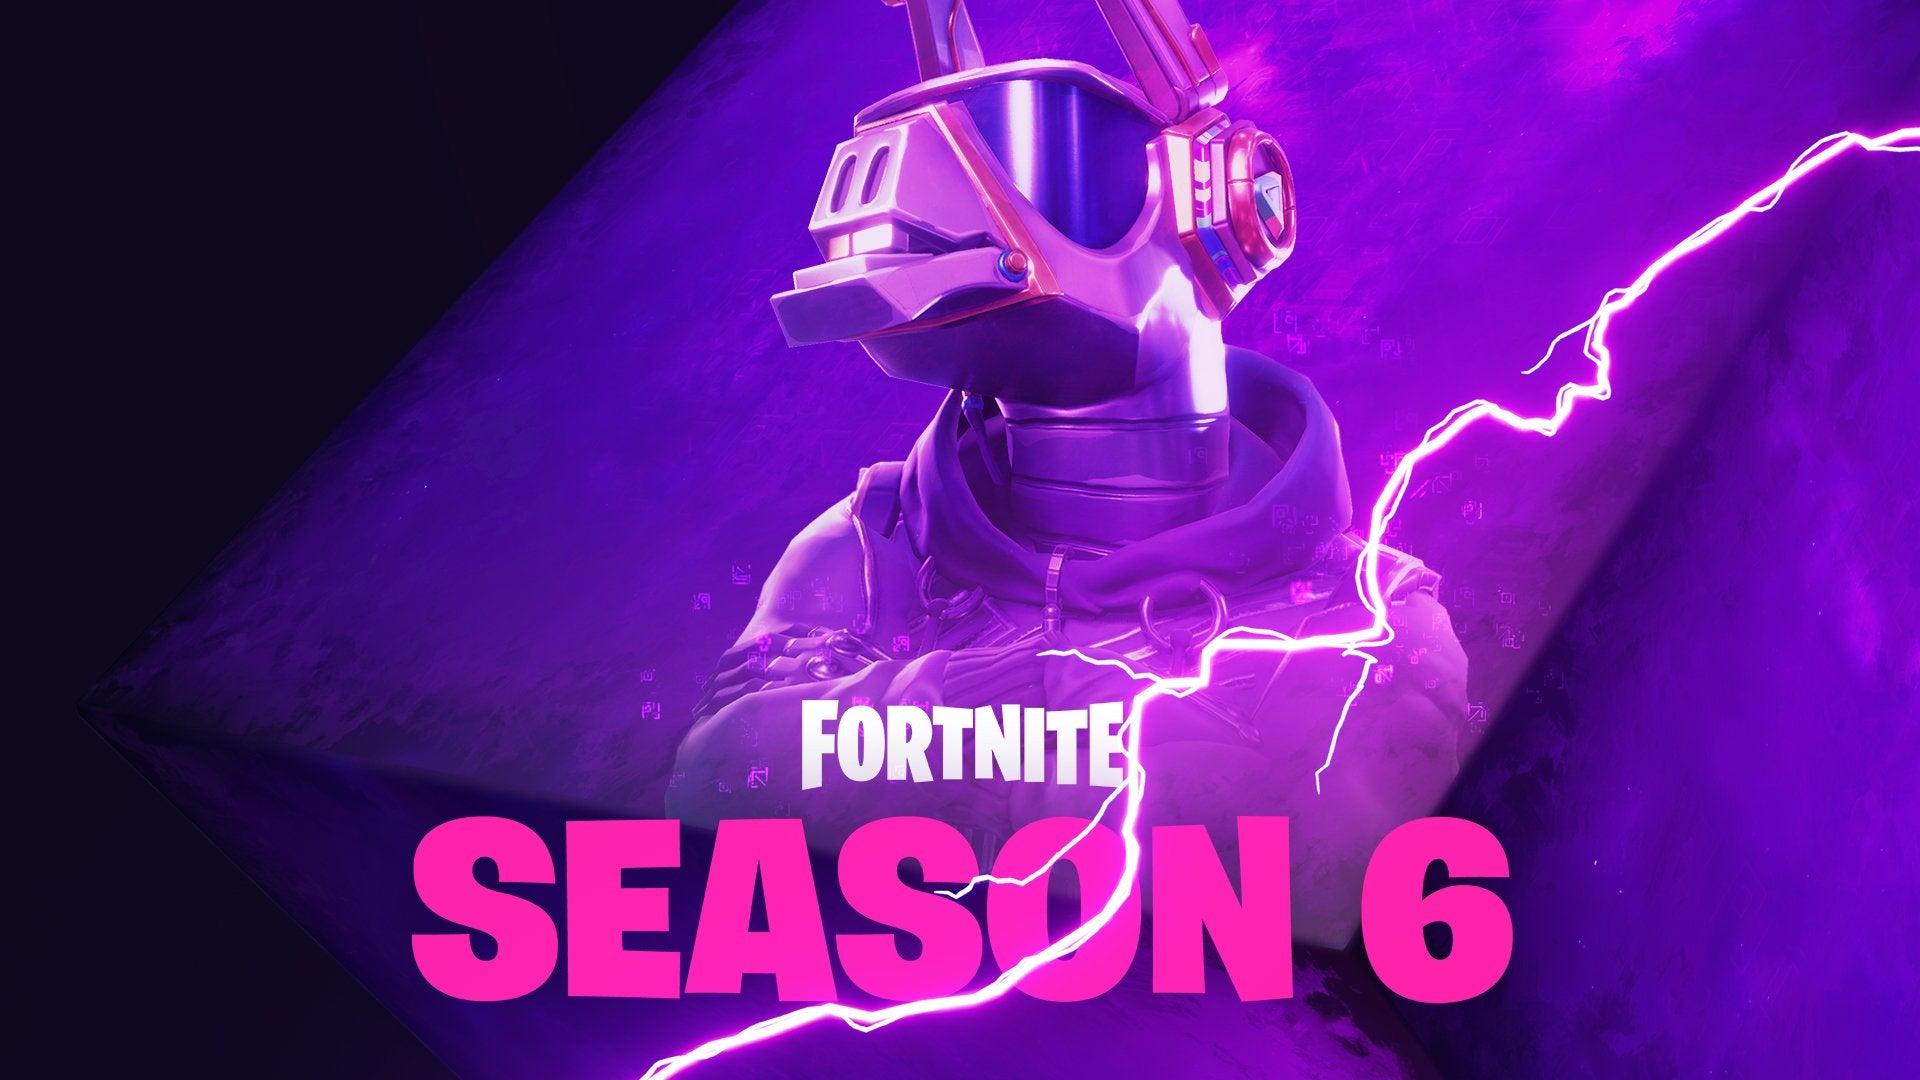 Image for Fortnite Season 6: first official tease shows off DJ llama skin